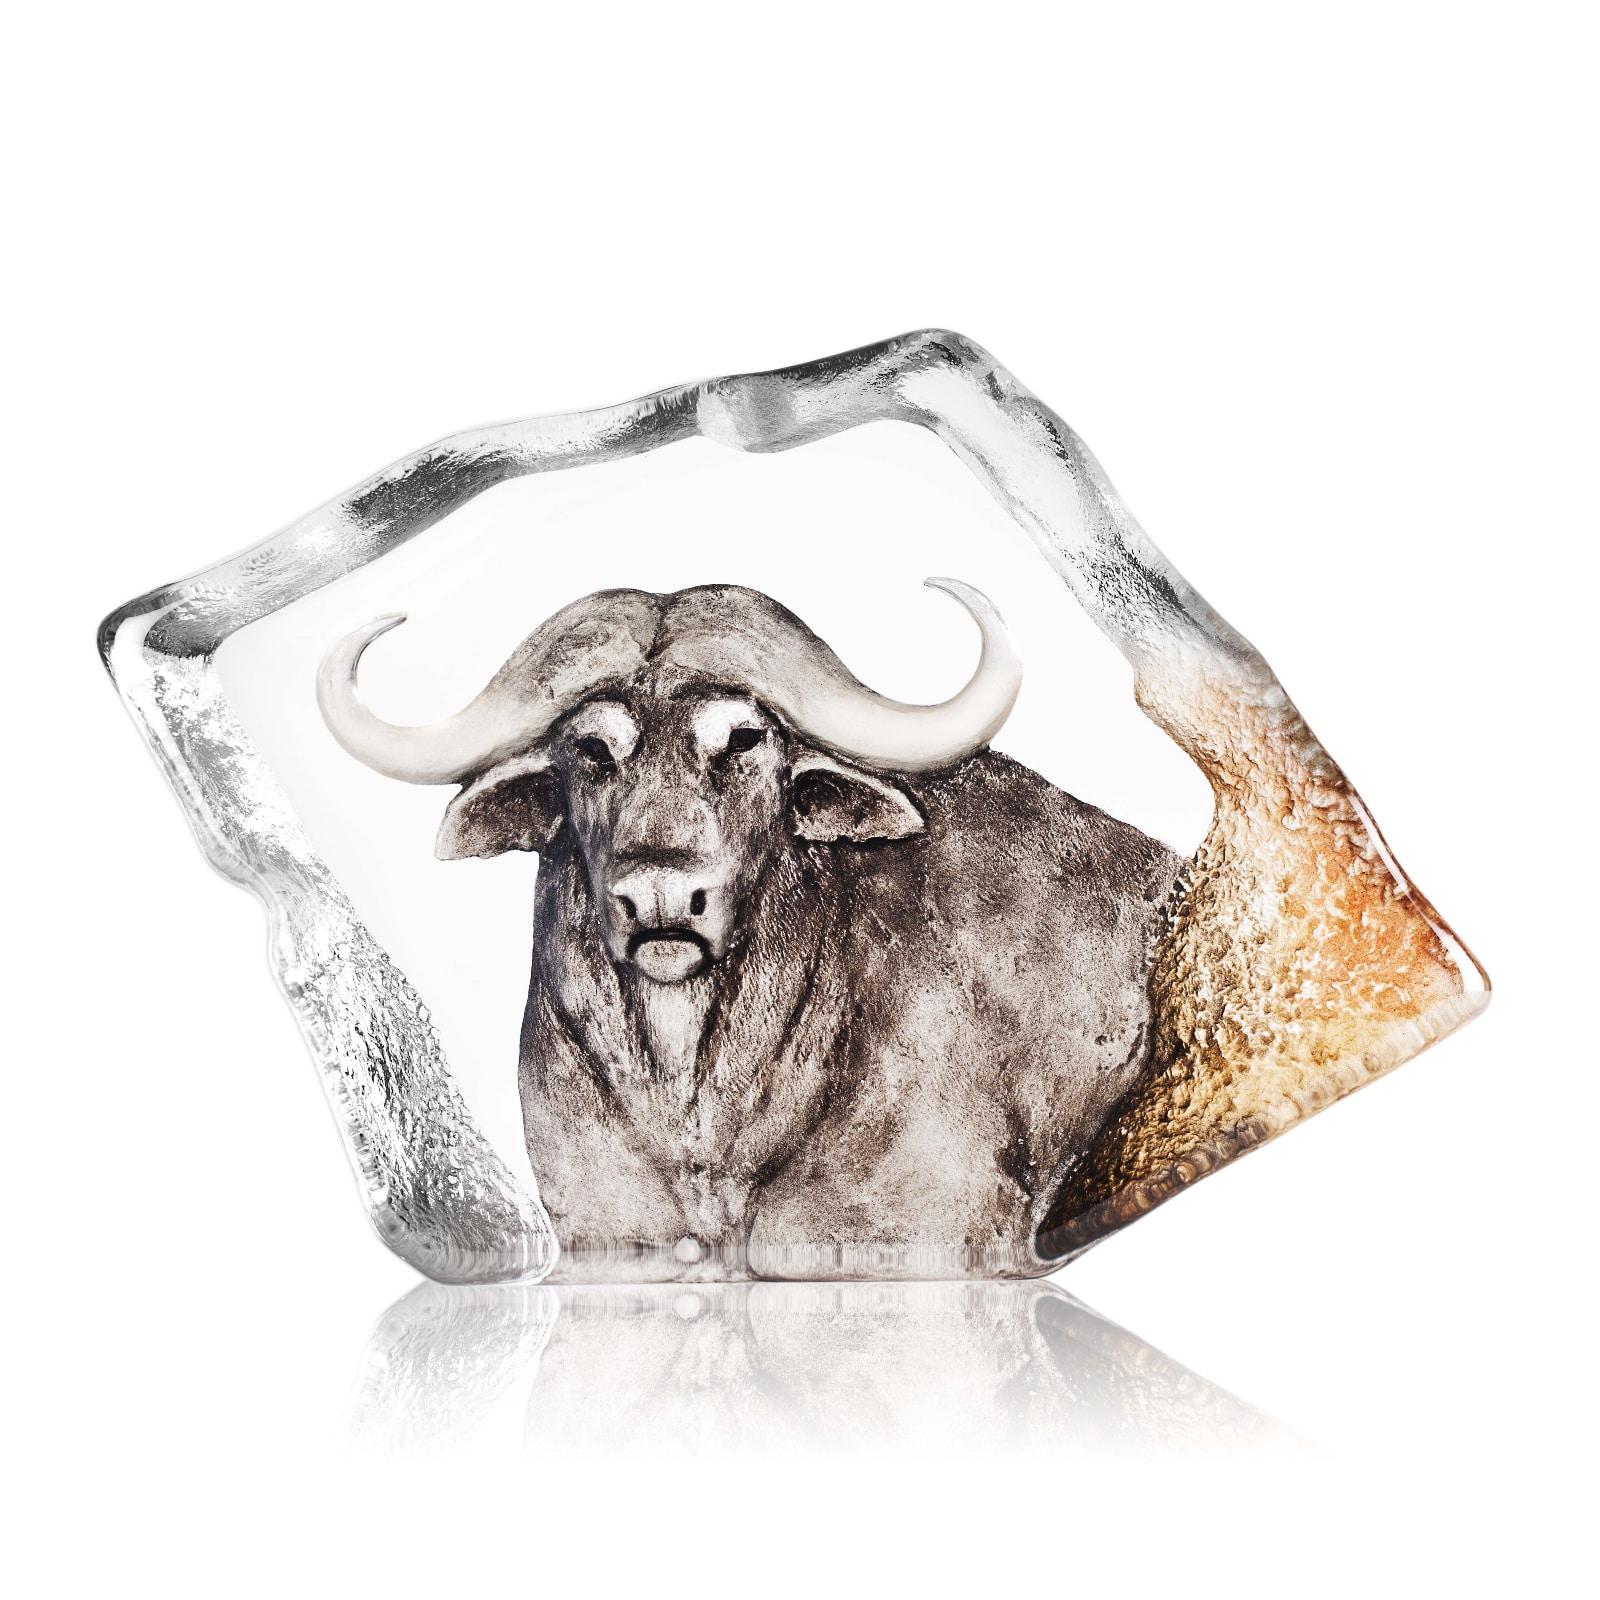 Mats Jonasson - Water Buffalo